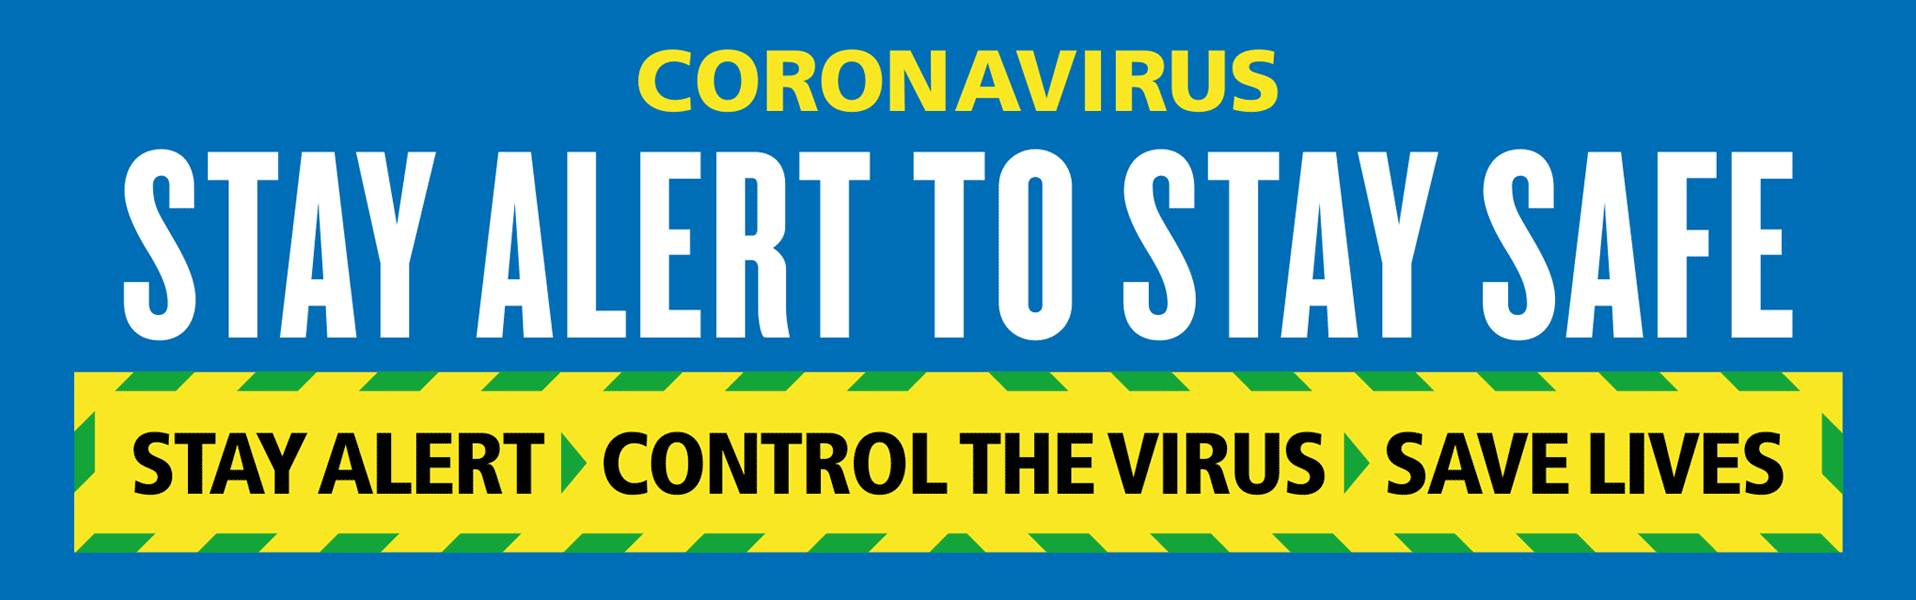 Coronavirus (COVID-19) - Stay alert, stay safe